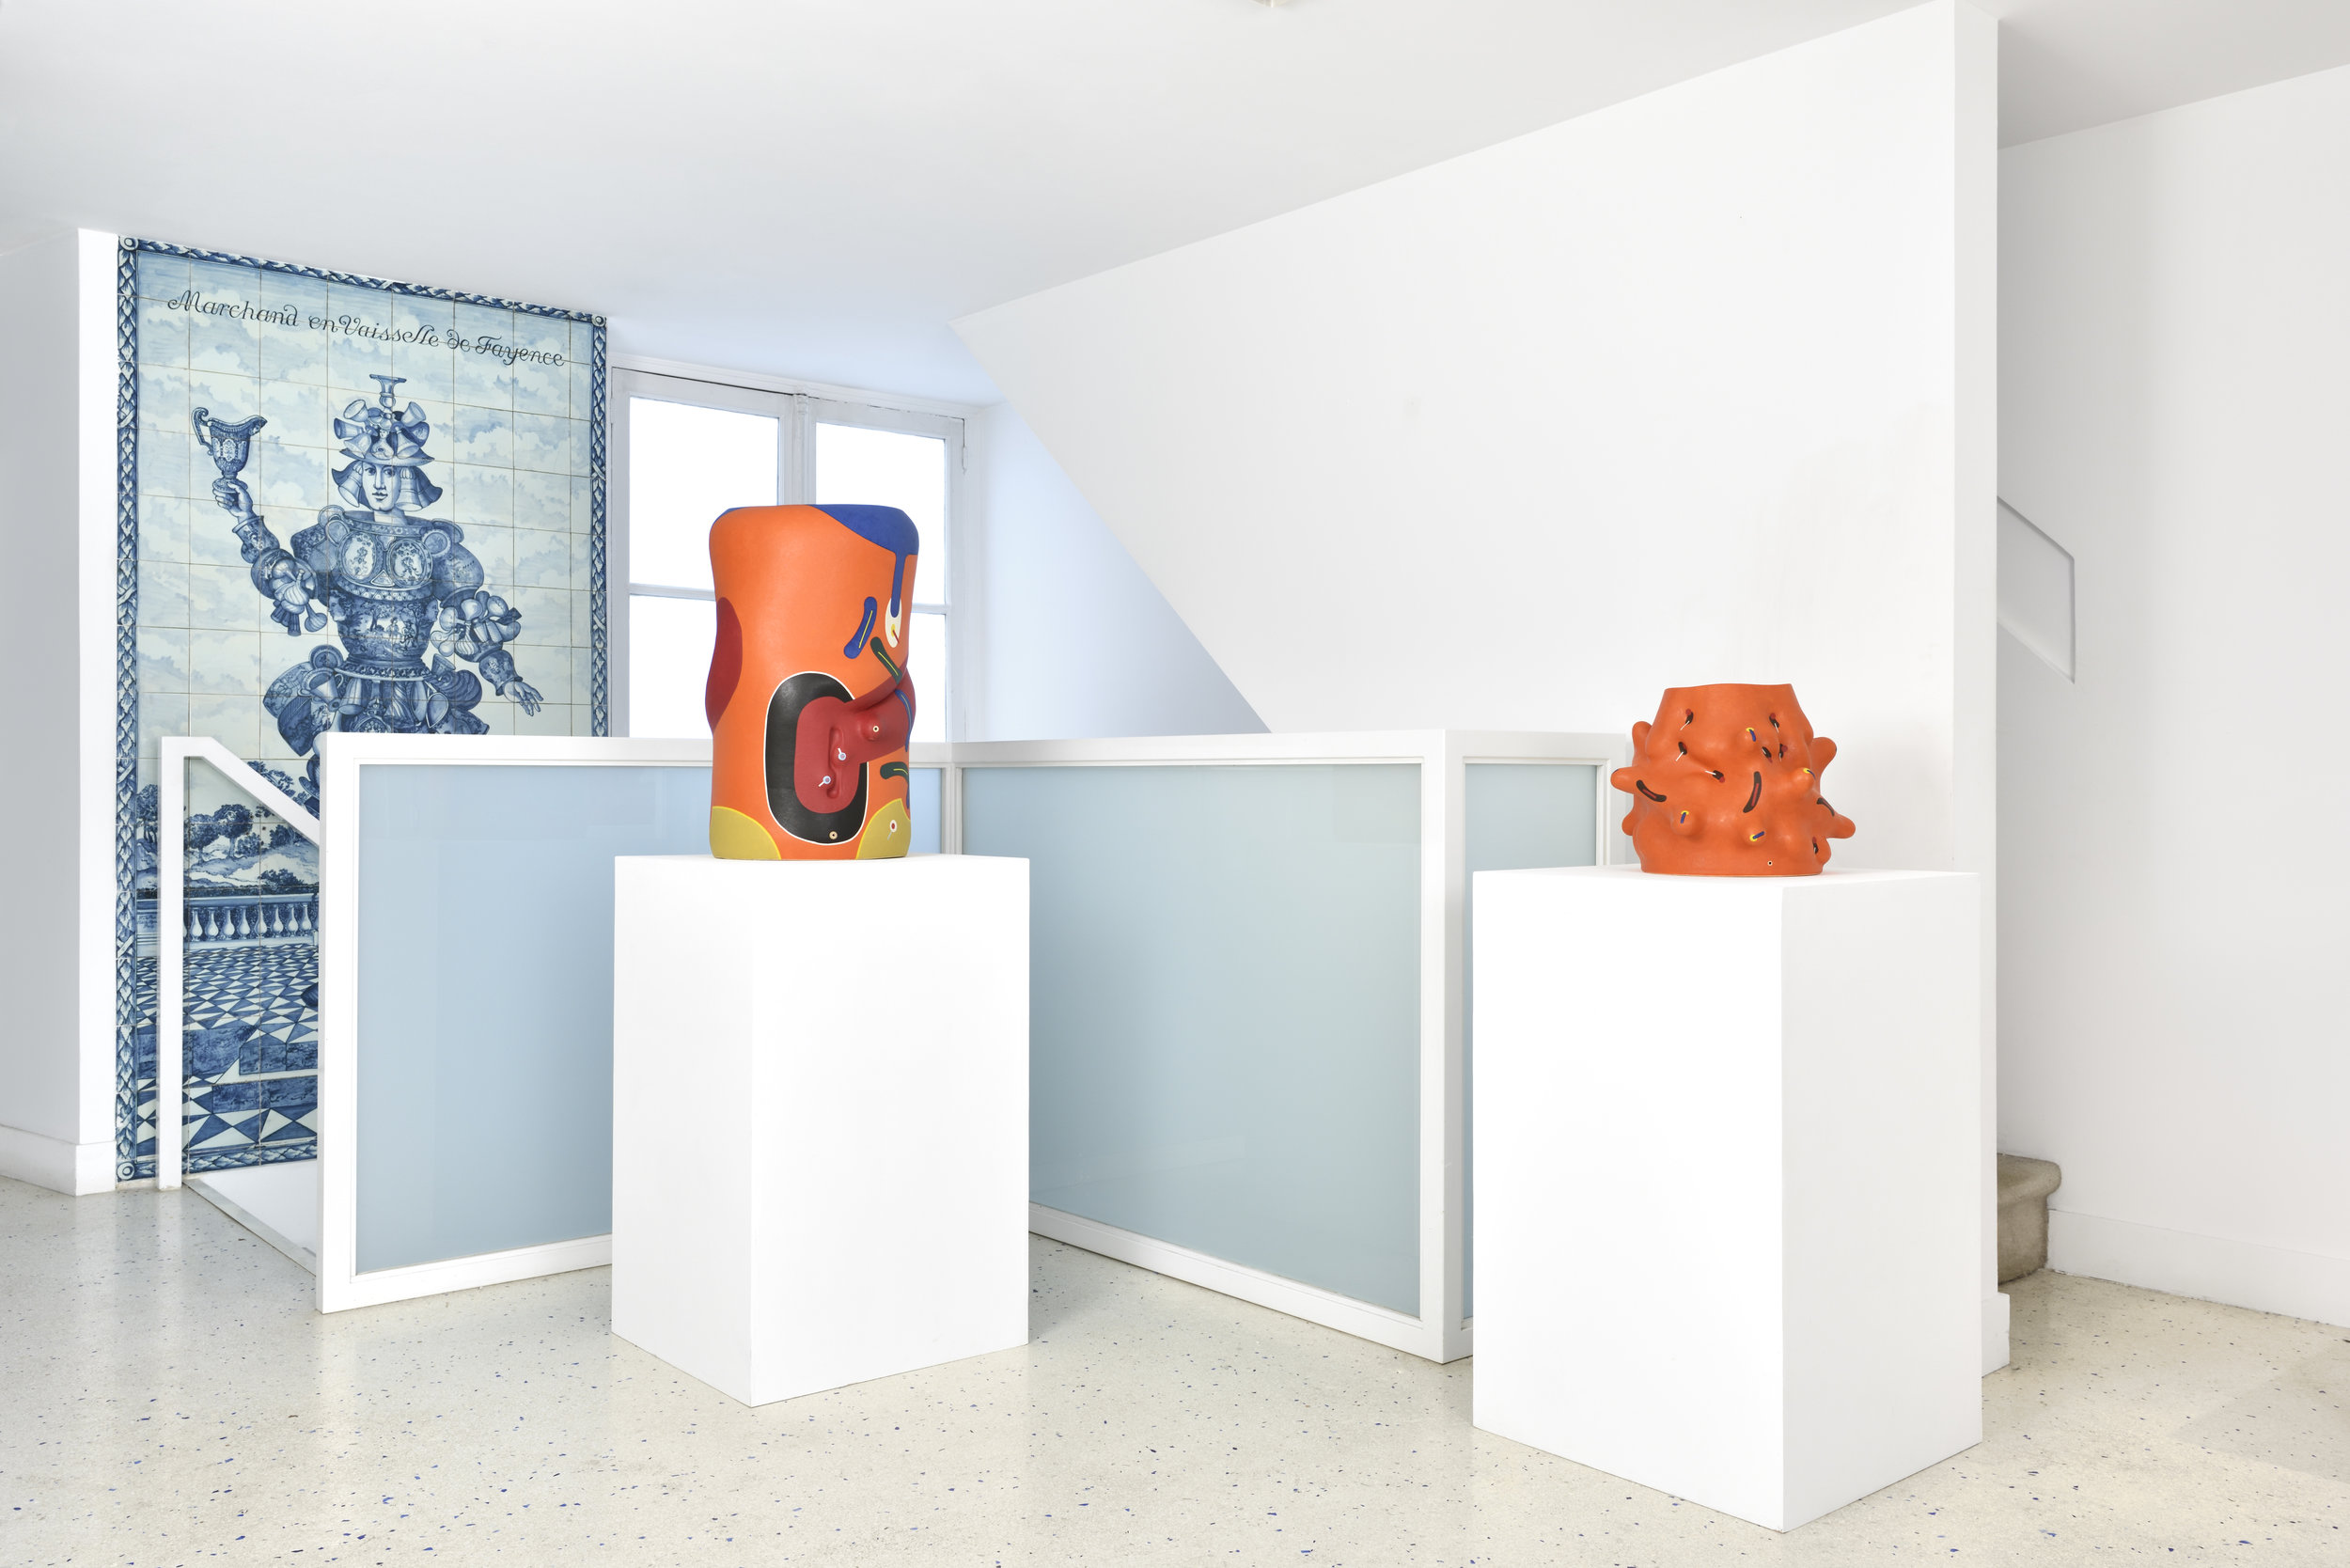 Crédit Photo Rebecca Fanuele  Courtesy Galerie Lefebvre & Fils & José Sierra